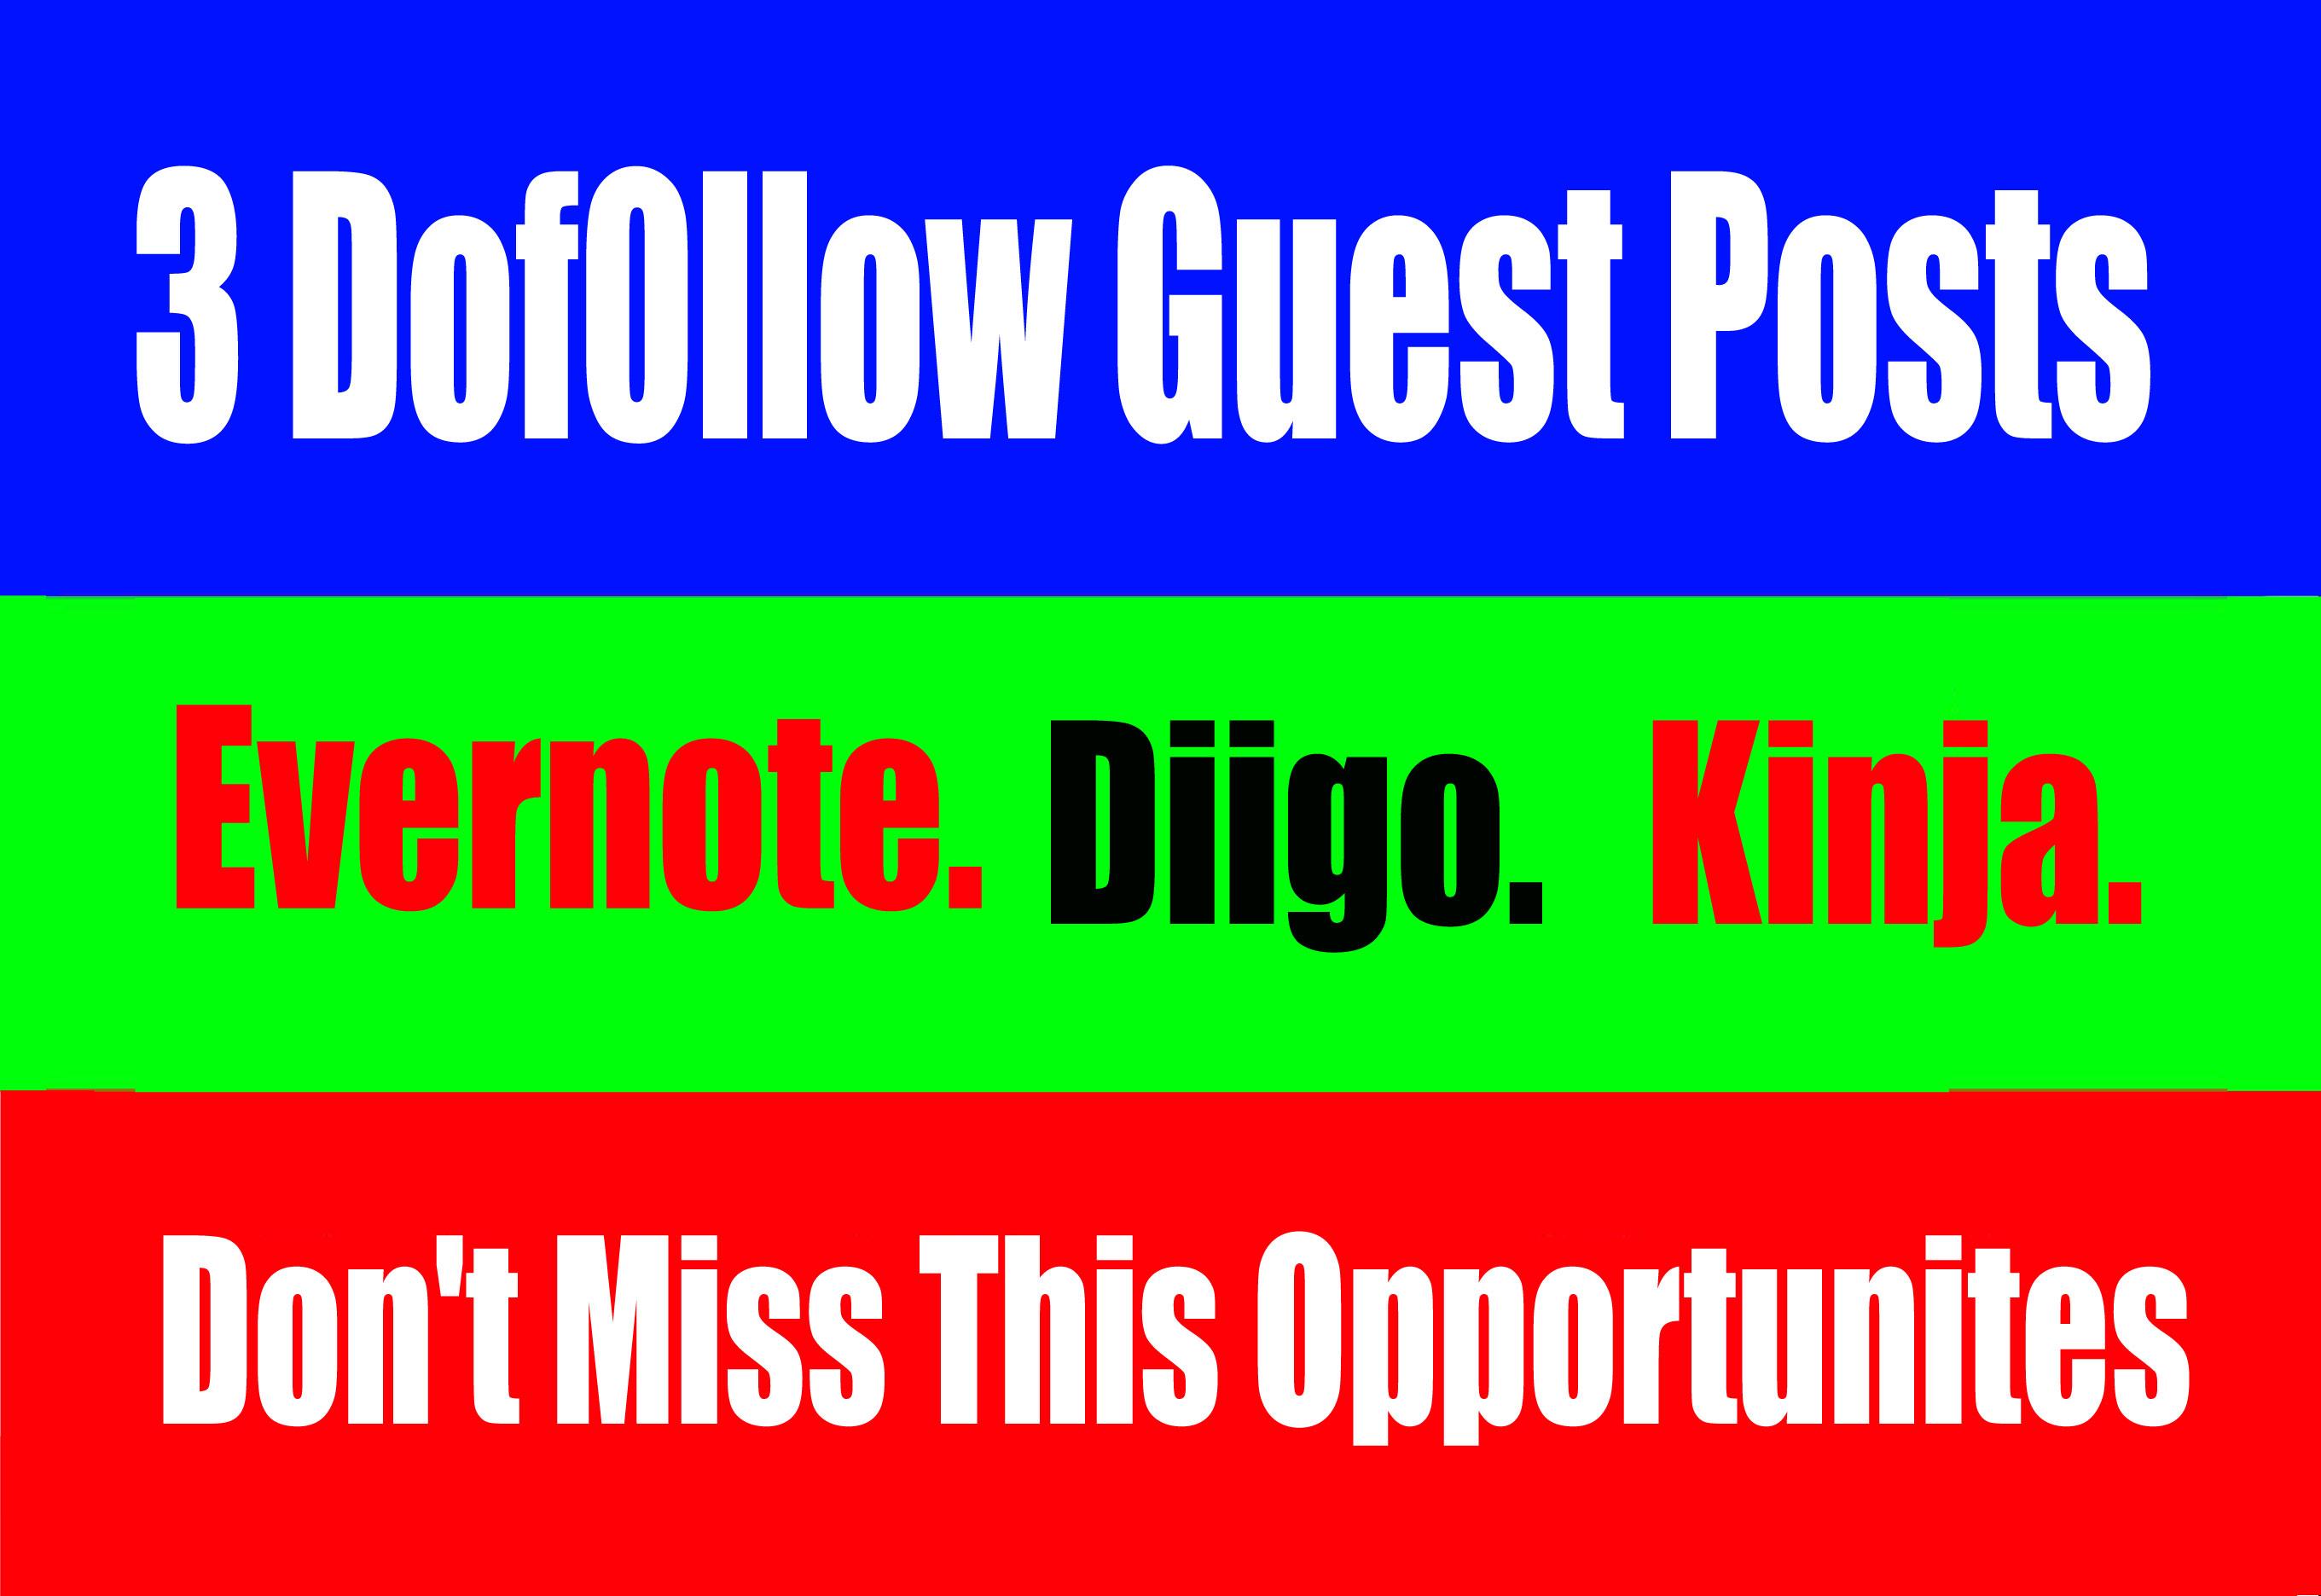 3 Dof0llow Guest post On. High DA 90+ websites Boost your SEO Ranking